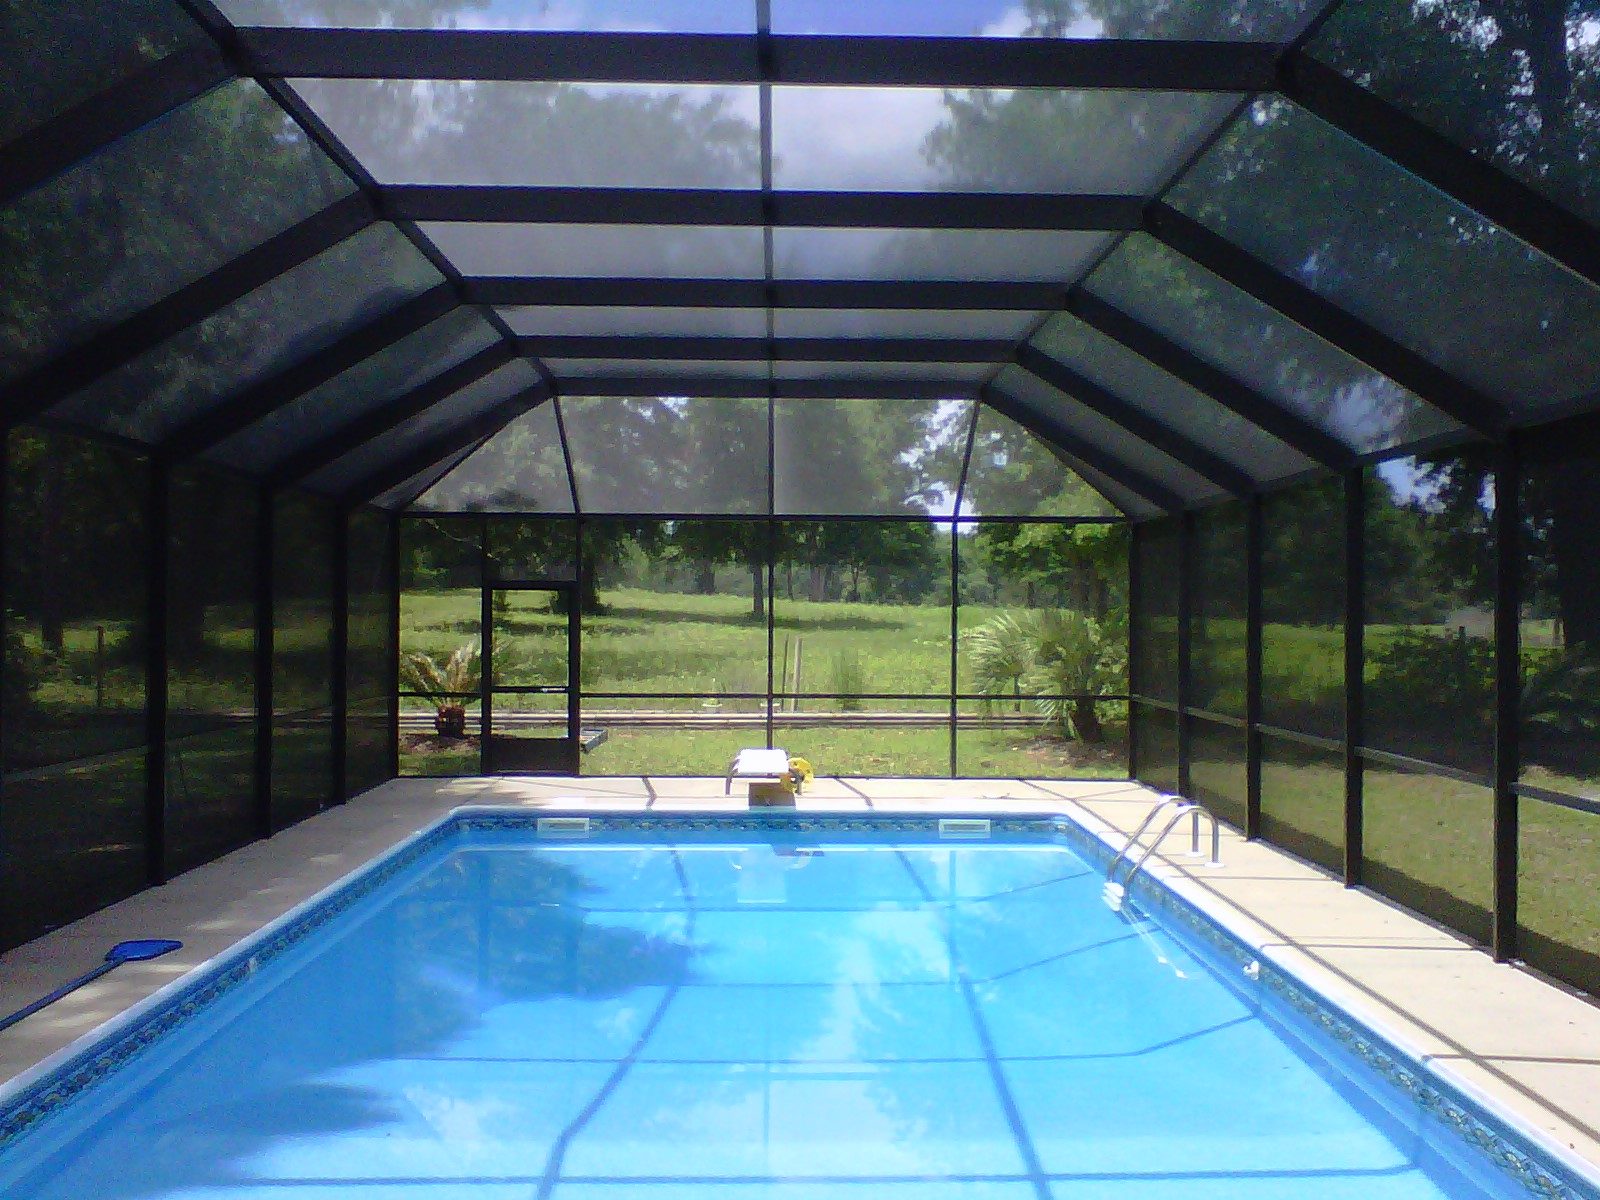 Pool Enclosures Usa Estimating Pool Enclosure Costs